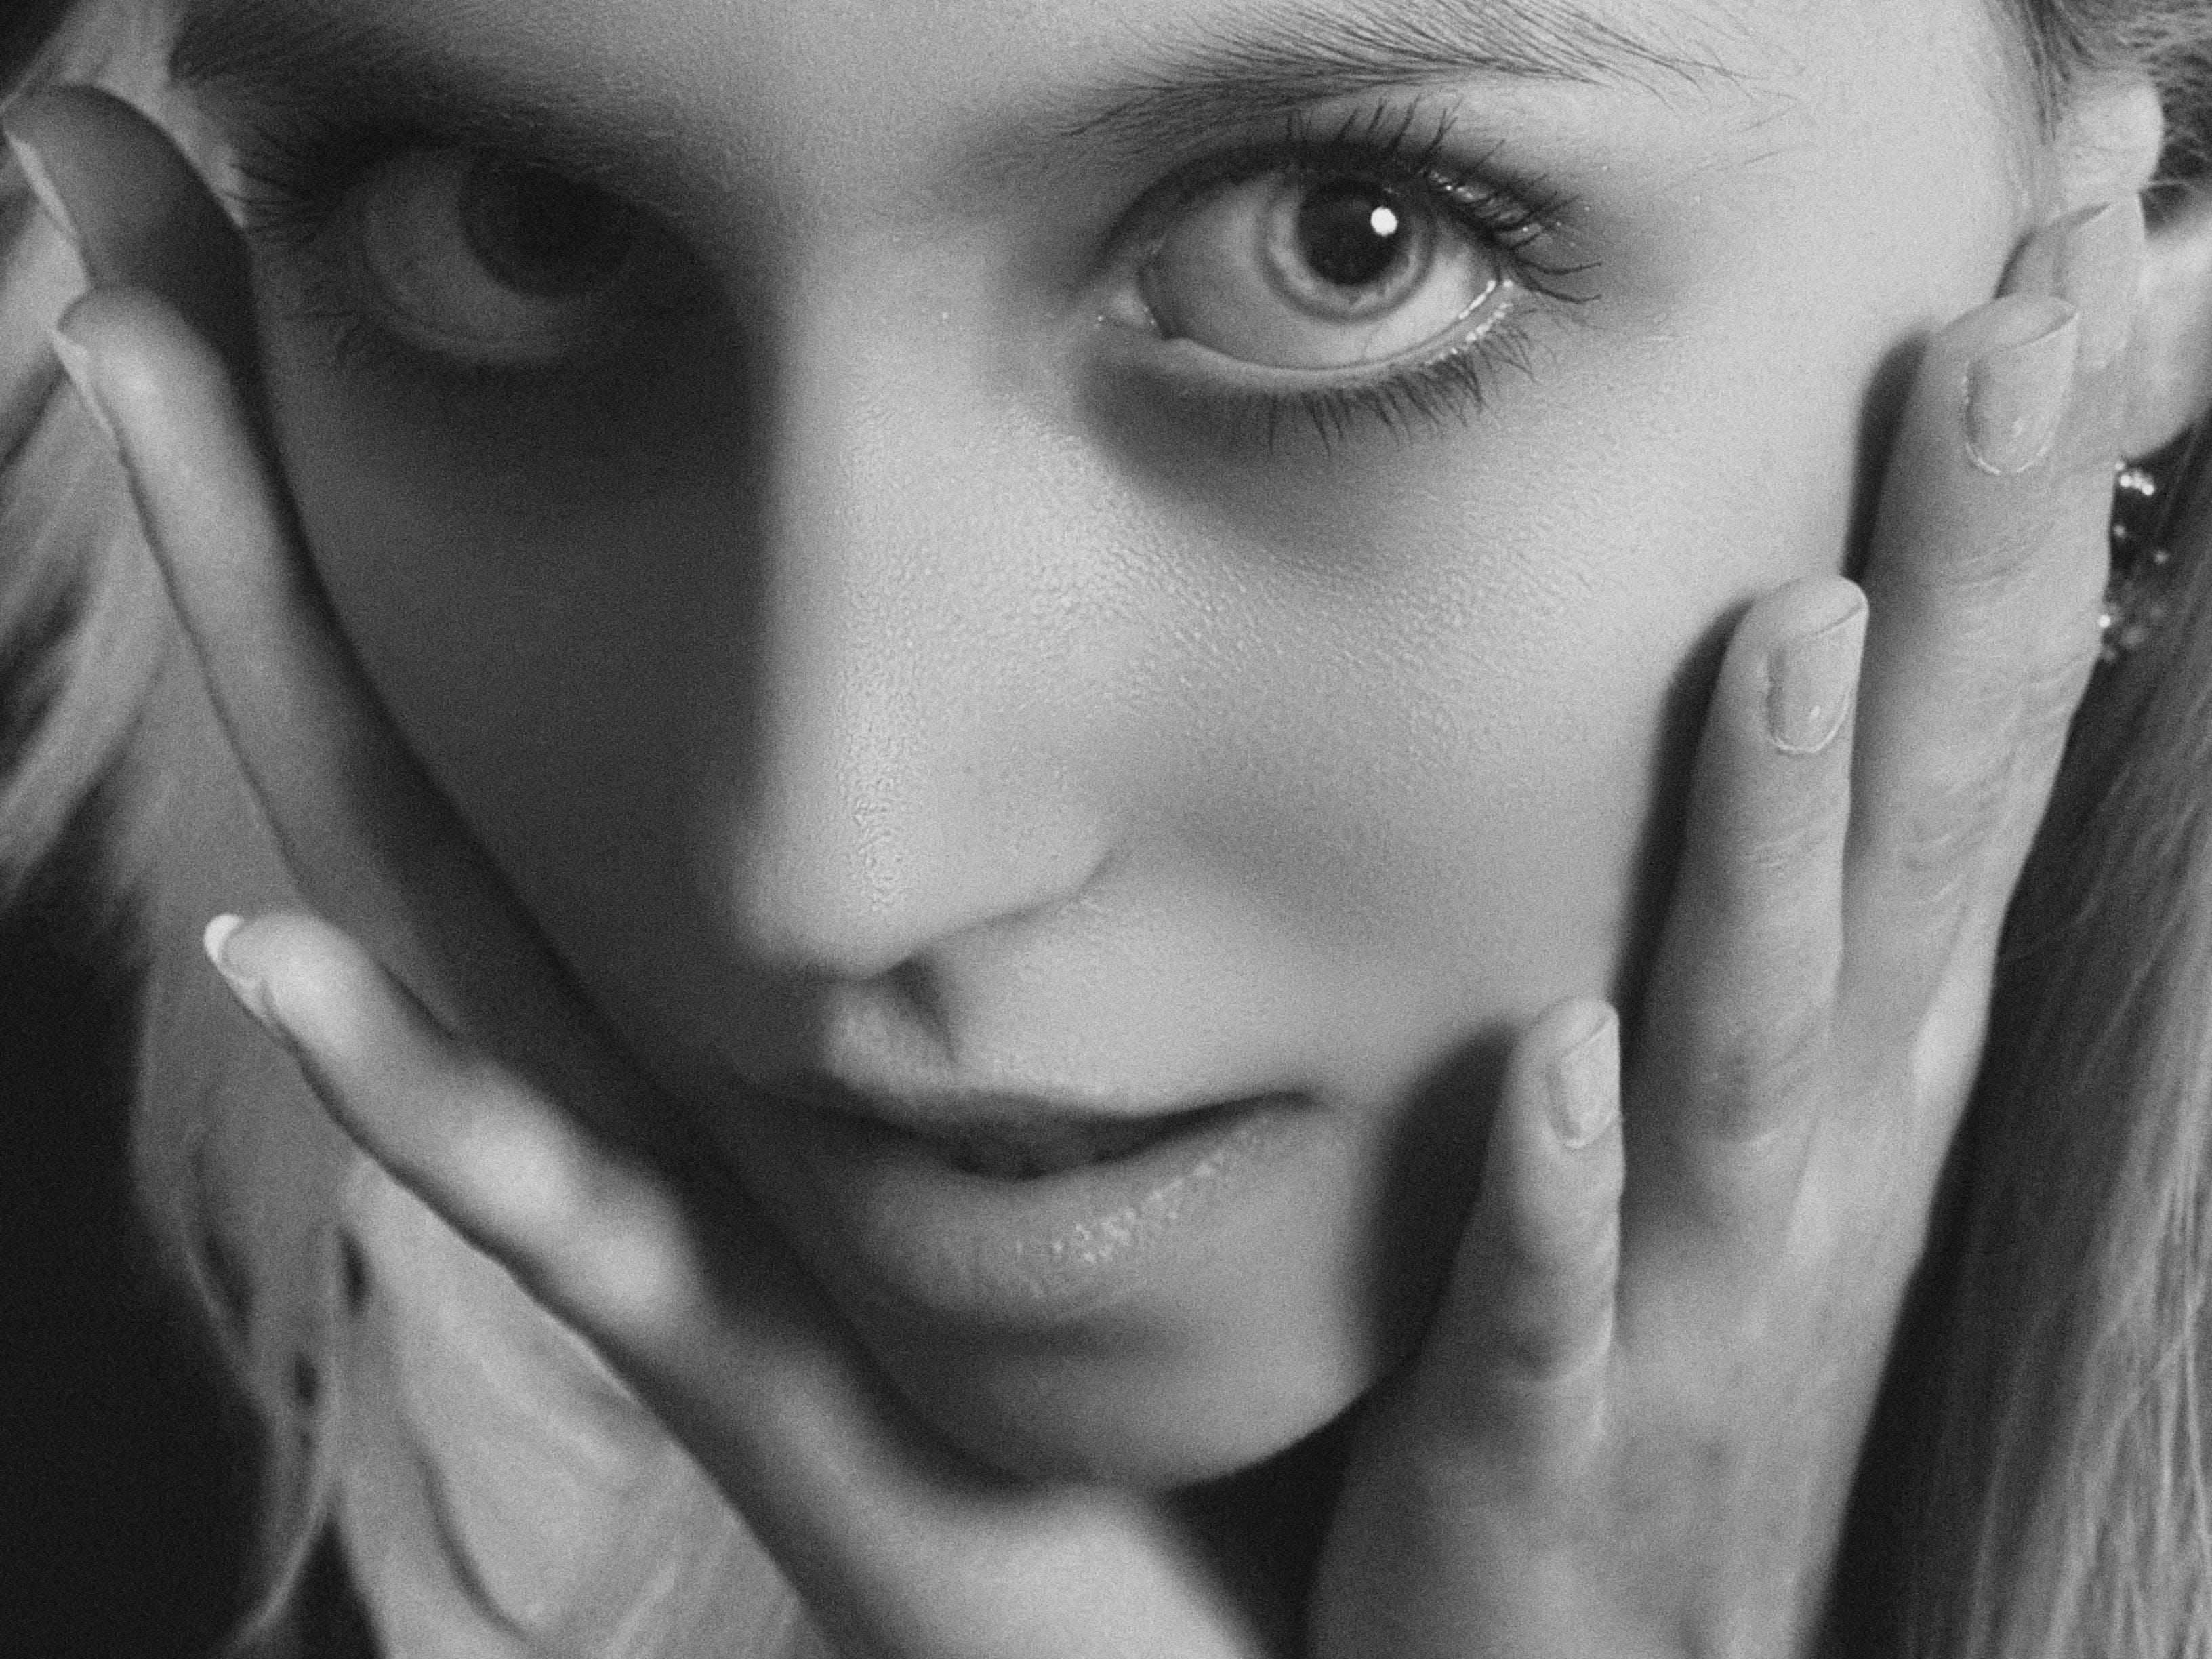 Kostenloses Stock Foto zu девушка, портрет, студия, черное и белое